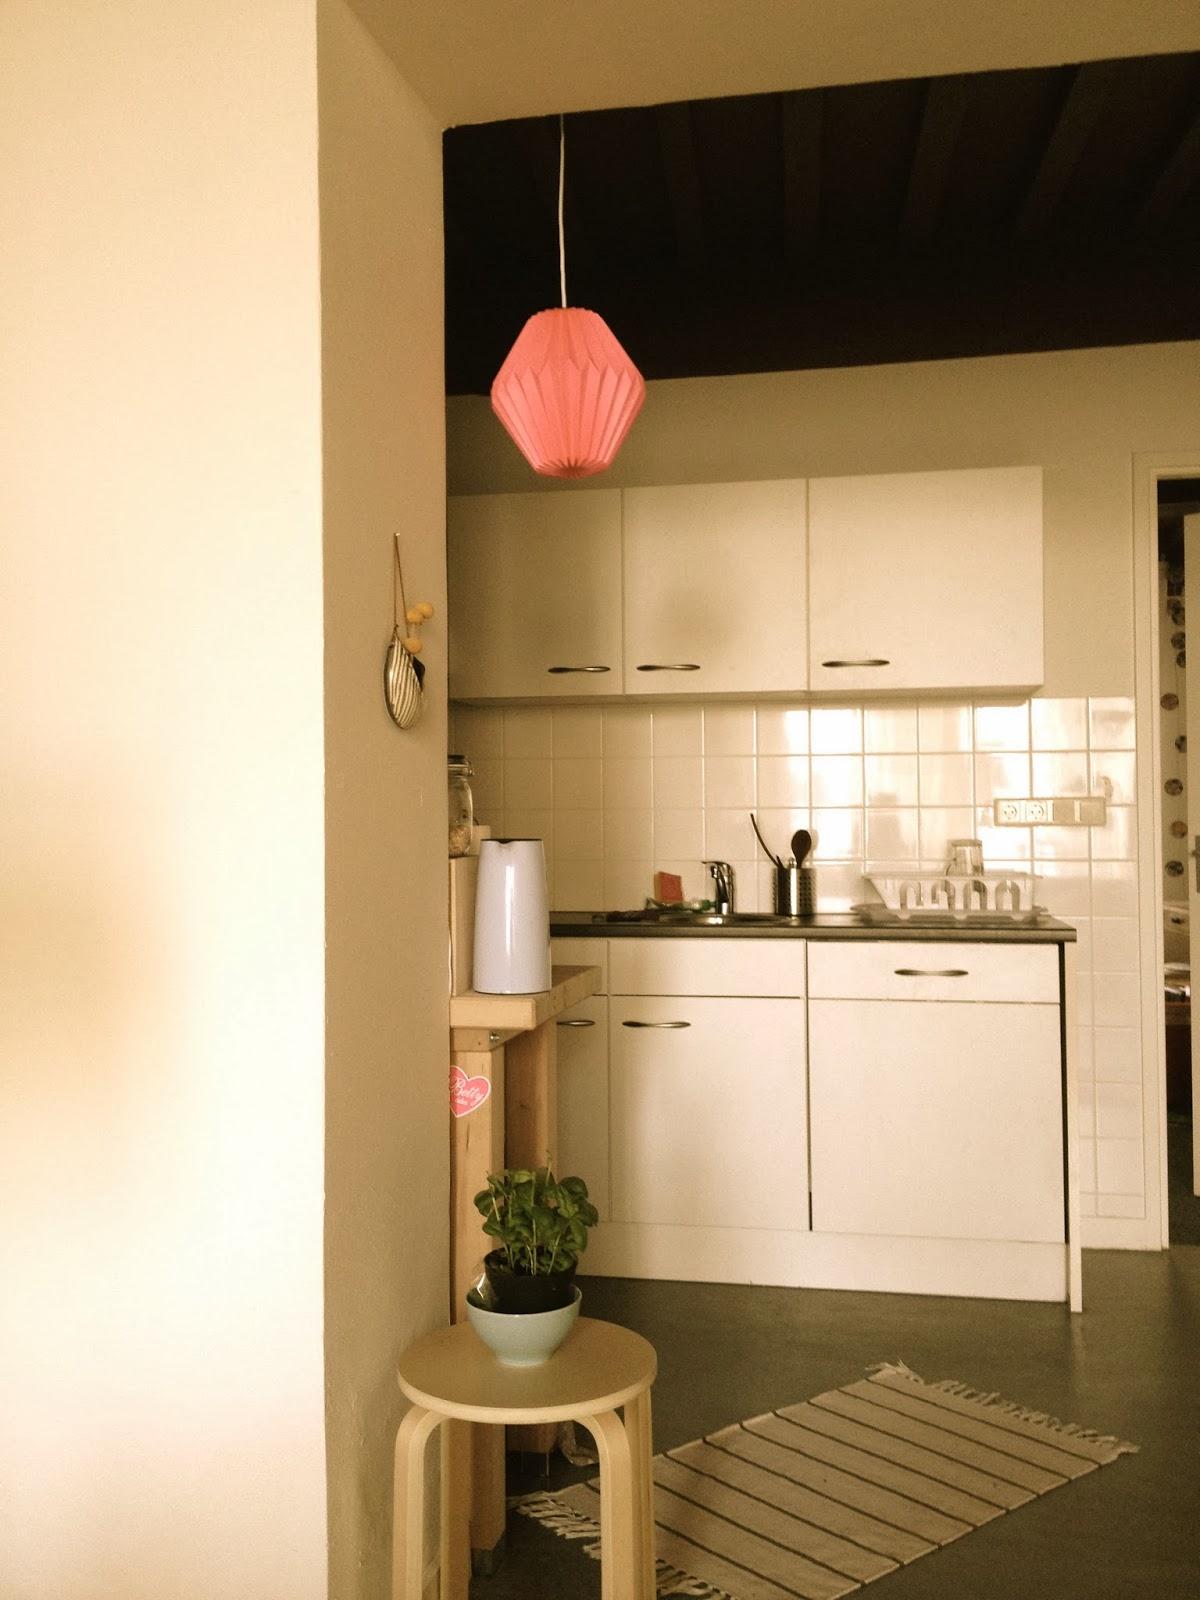 Ameli IKEA Home is where IKEA is : IMG4669 from ameliheartsikea.blogspot.com size 1200 x 1600 jpeg 202kB